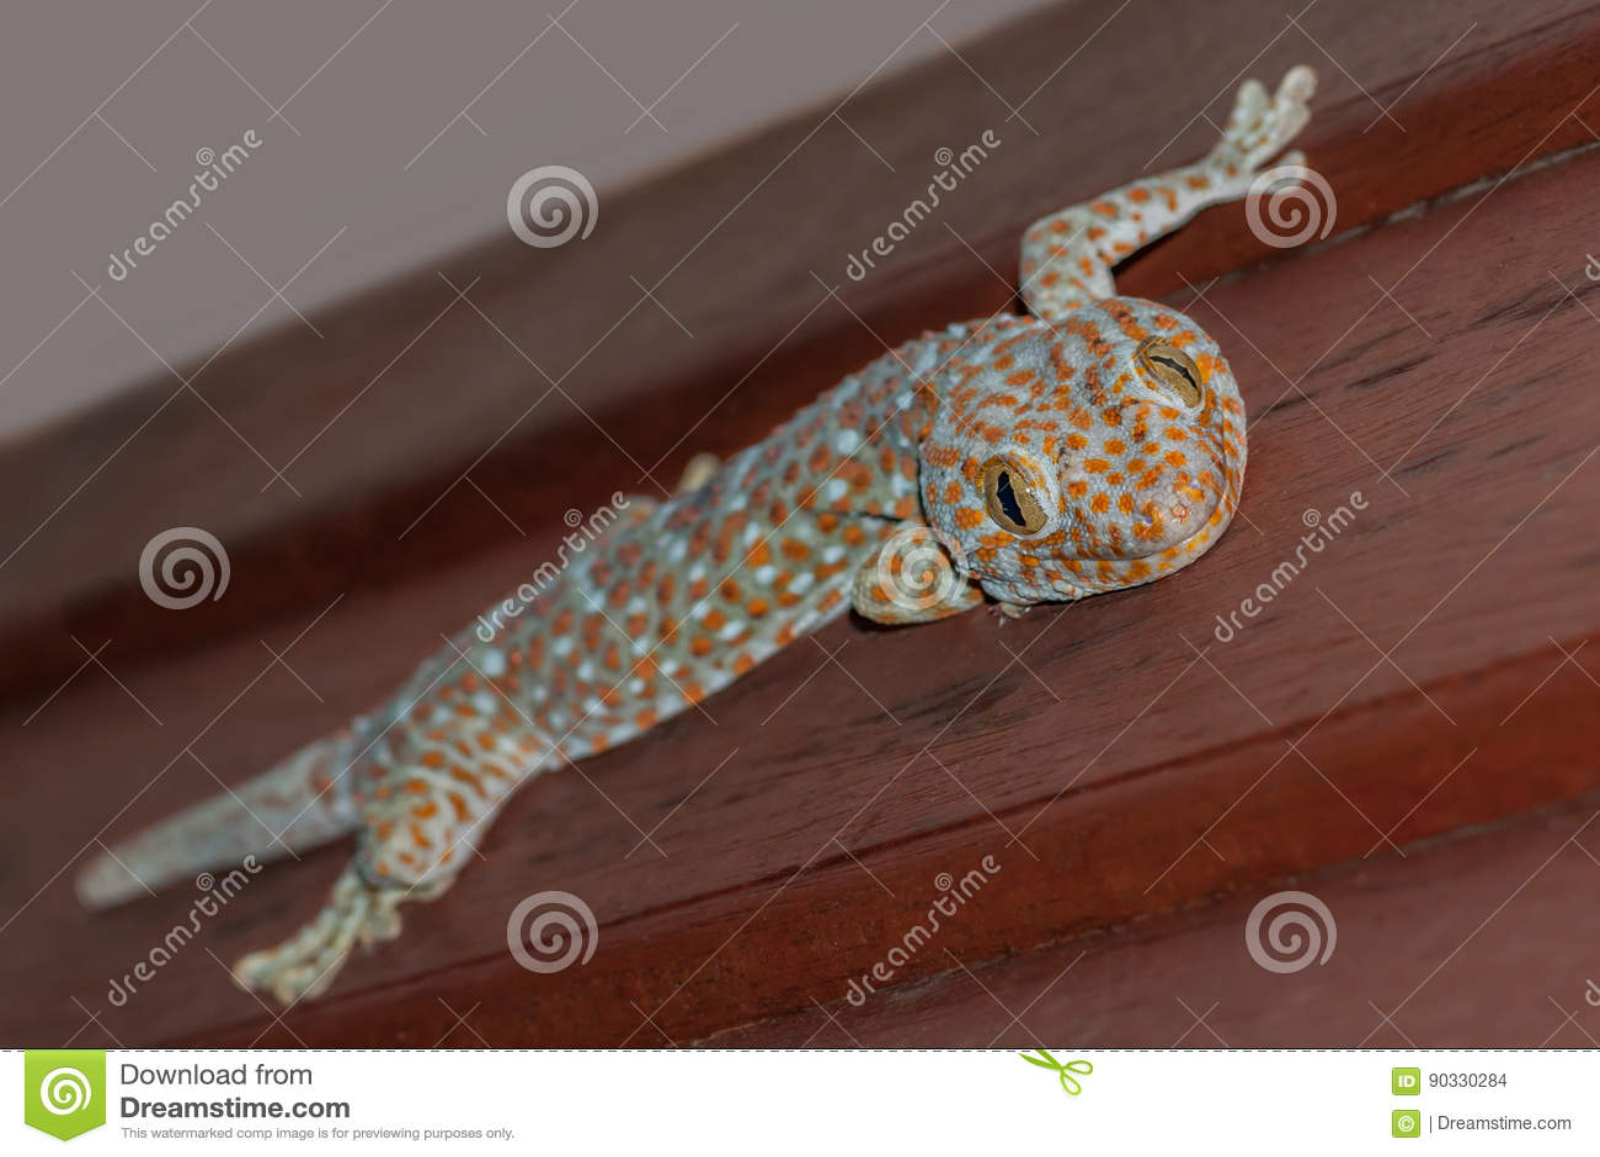 Tokee gekko gecko Tokay μπλε και πορτοκαλιάς σαυρών συνεδρίαση, σε έναν ξύλινο τοίχο και χαμόγελο